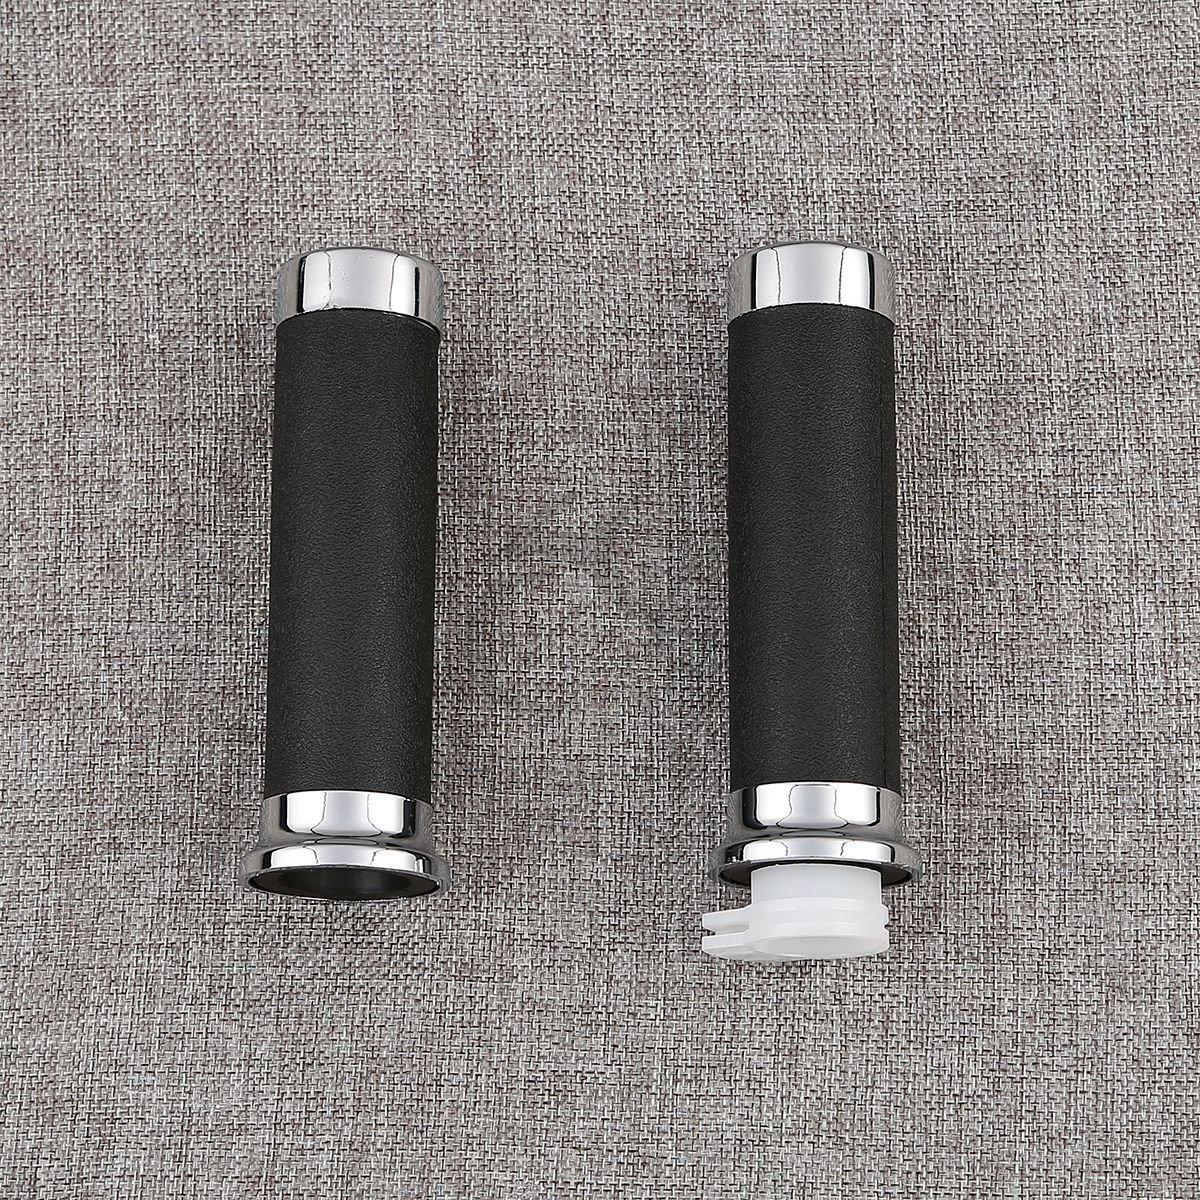 Soft Rubber /& Plastic Hand Grips Handle Bar for Harley Honda Yamaha FidgetGear 1 25mm